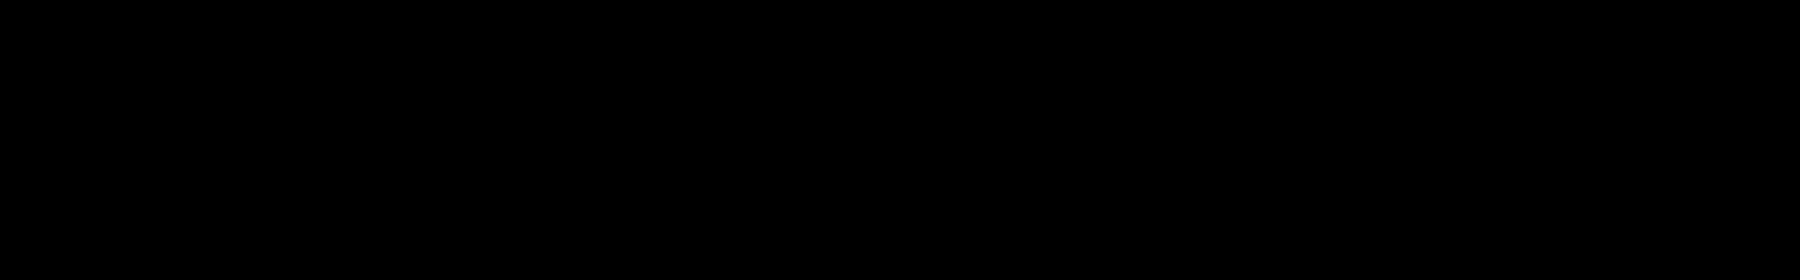 Doppler - Melodic Techno & House audio waveform